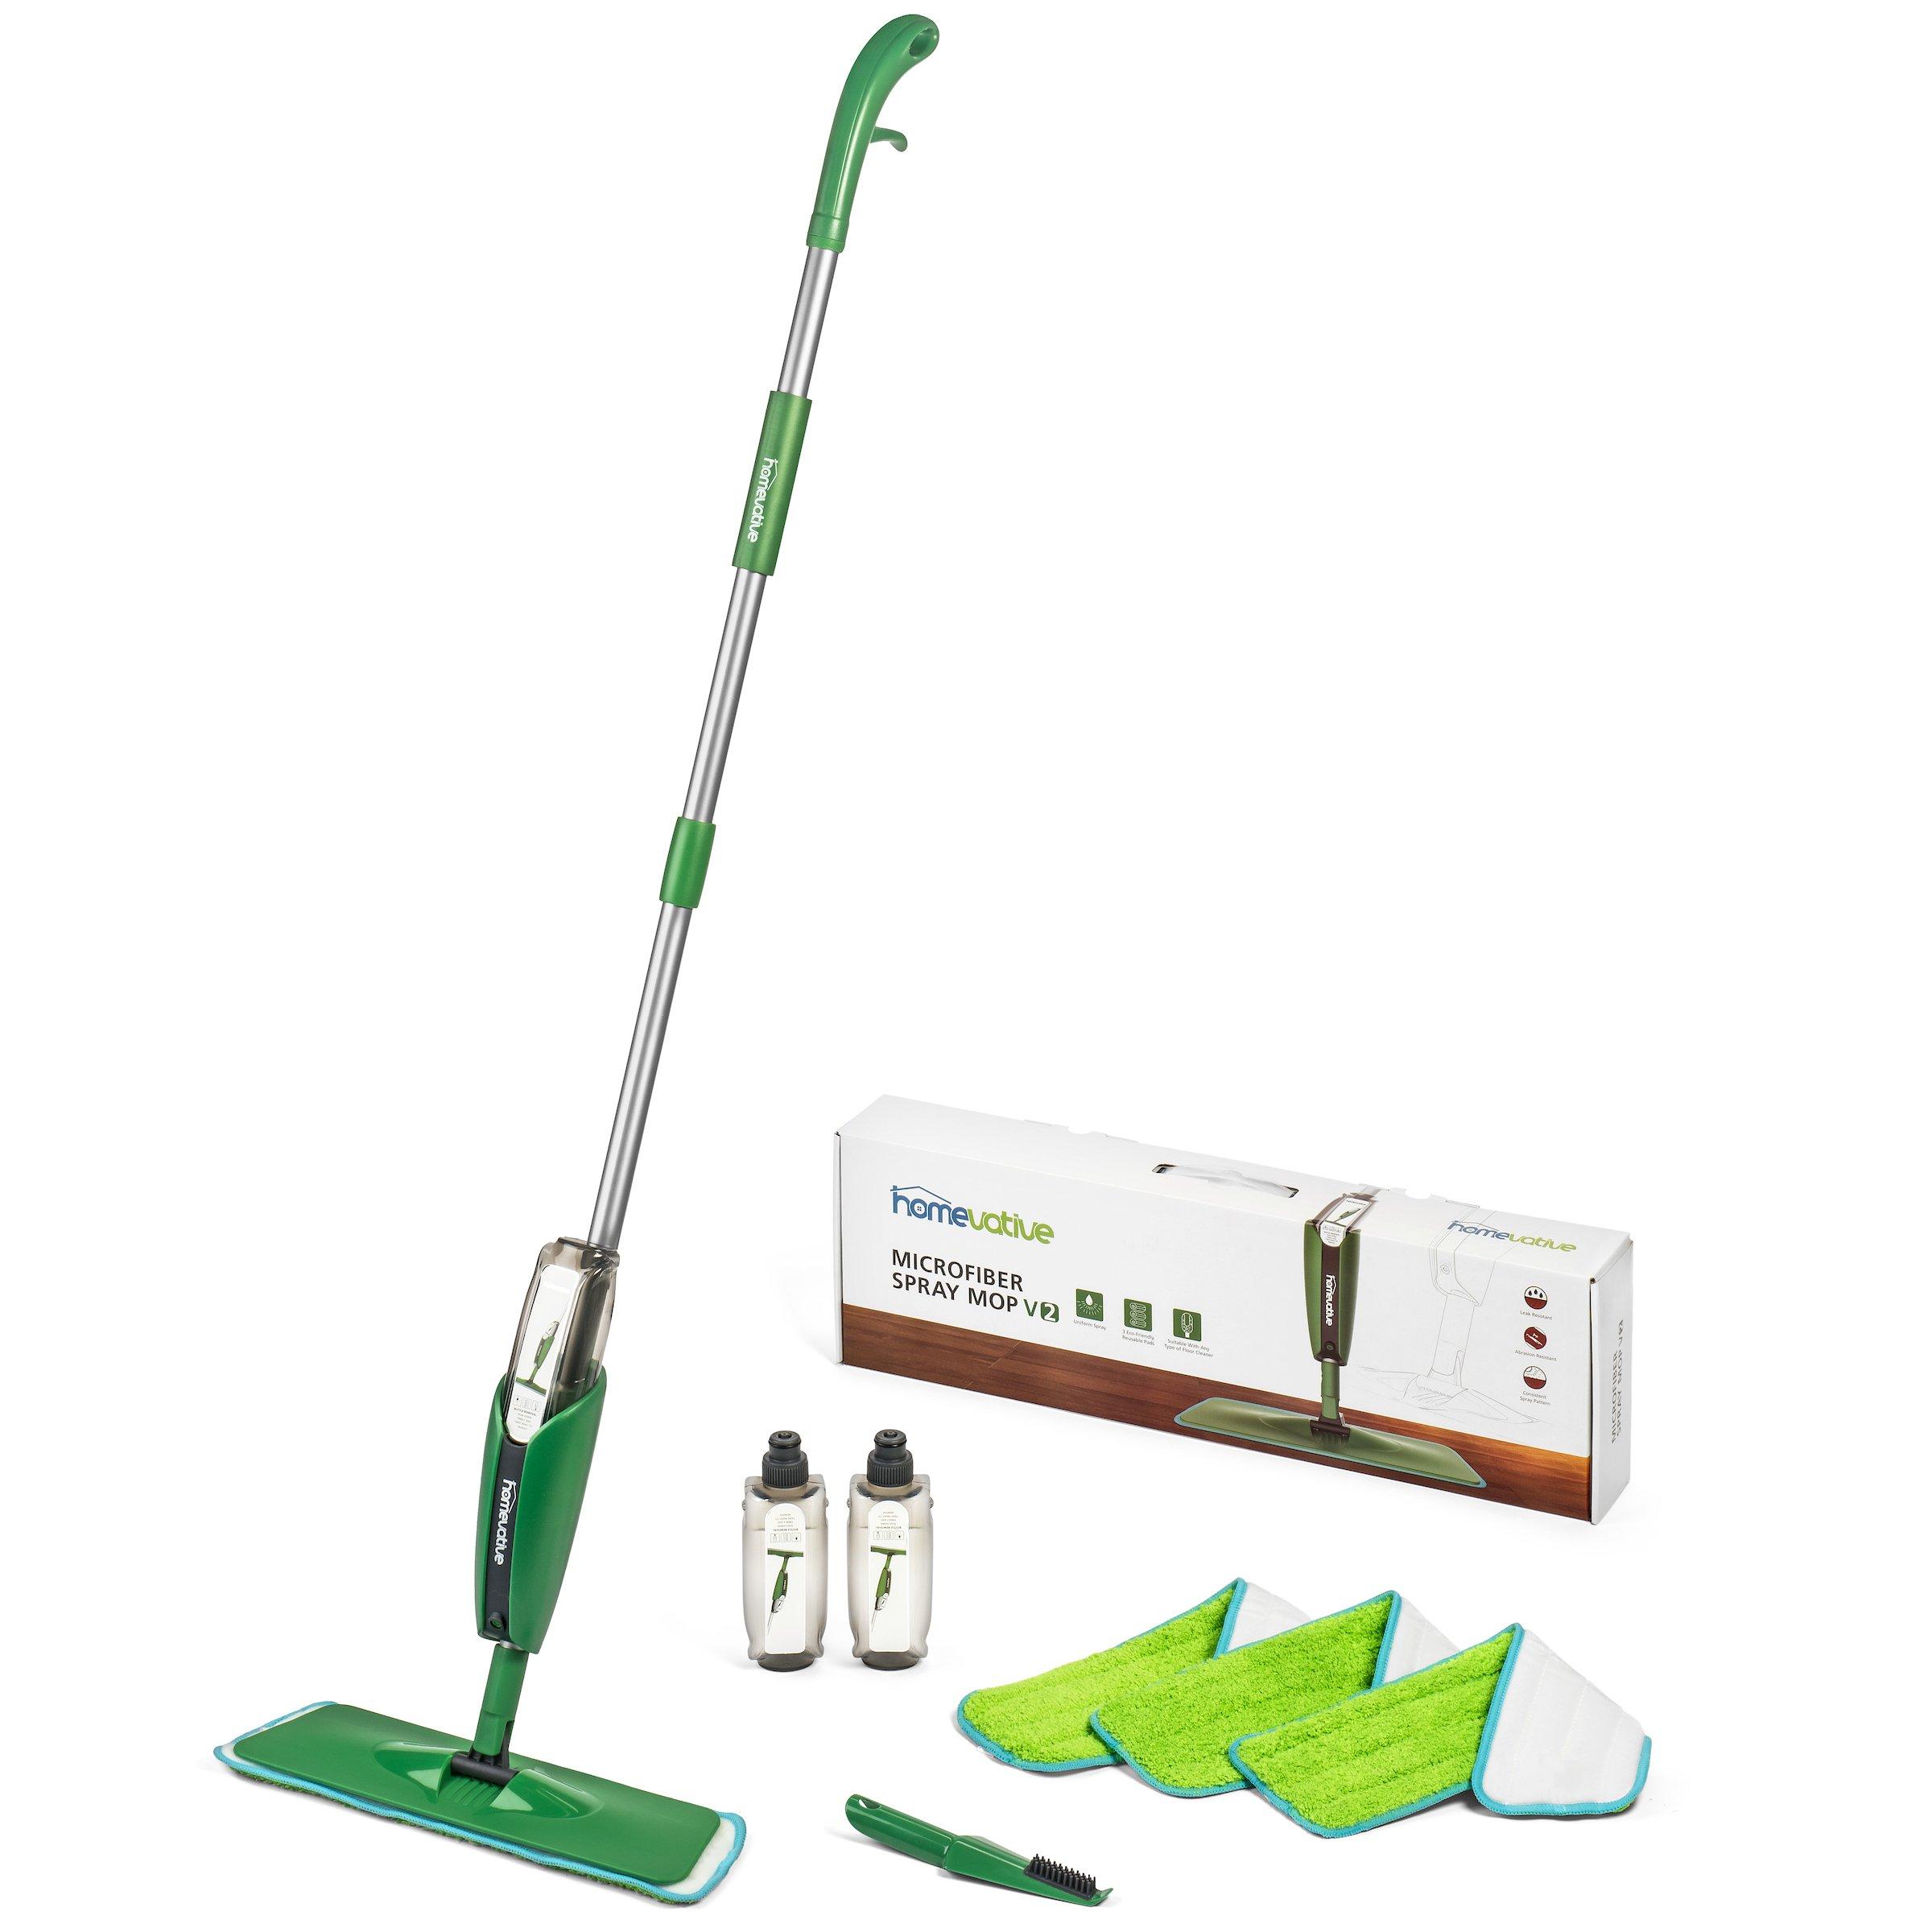 Homevative Microfiber Spray Mop Kit /w 3 pads, 2 bottles, and Precision Detailer, Floor push mop for kitchen, bathroom,